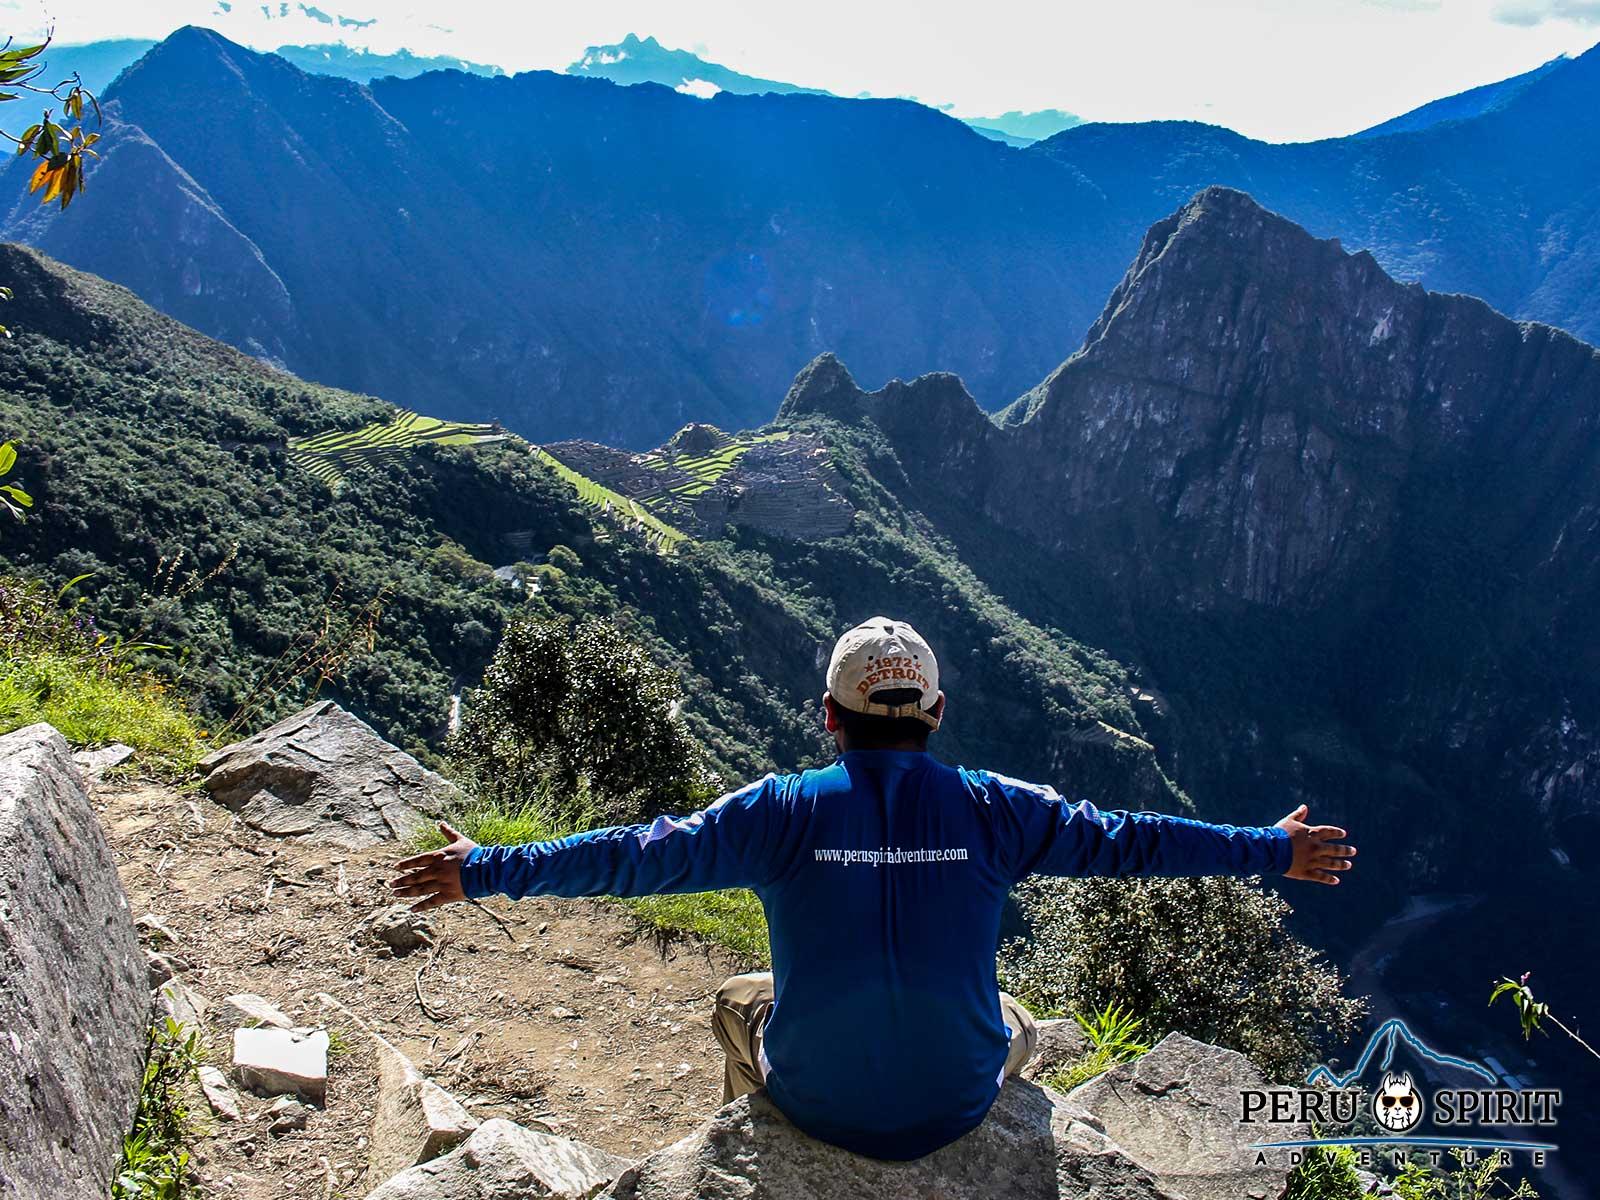 Trekking to Machu Picchu with Peru Spirit